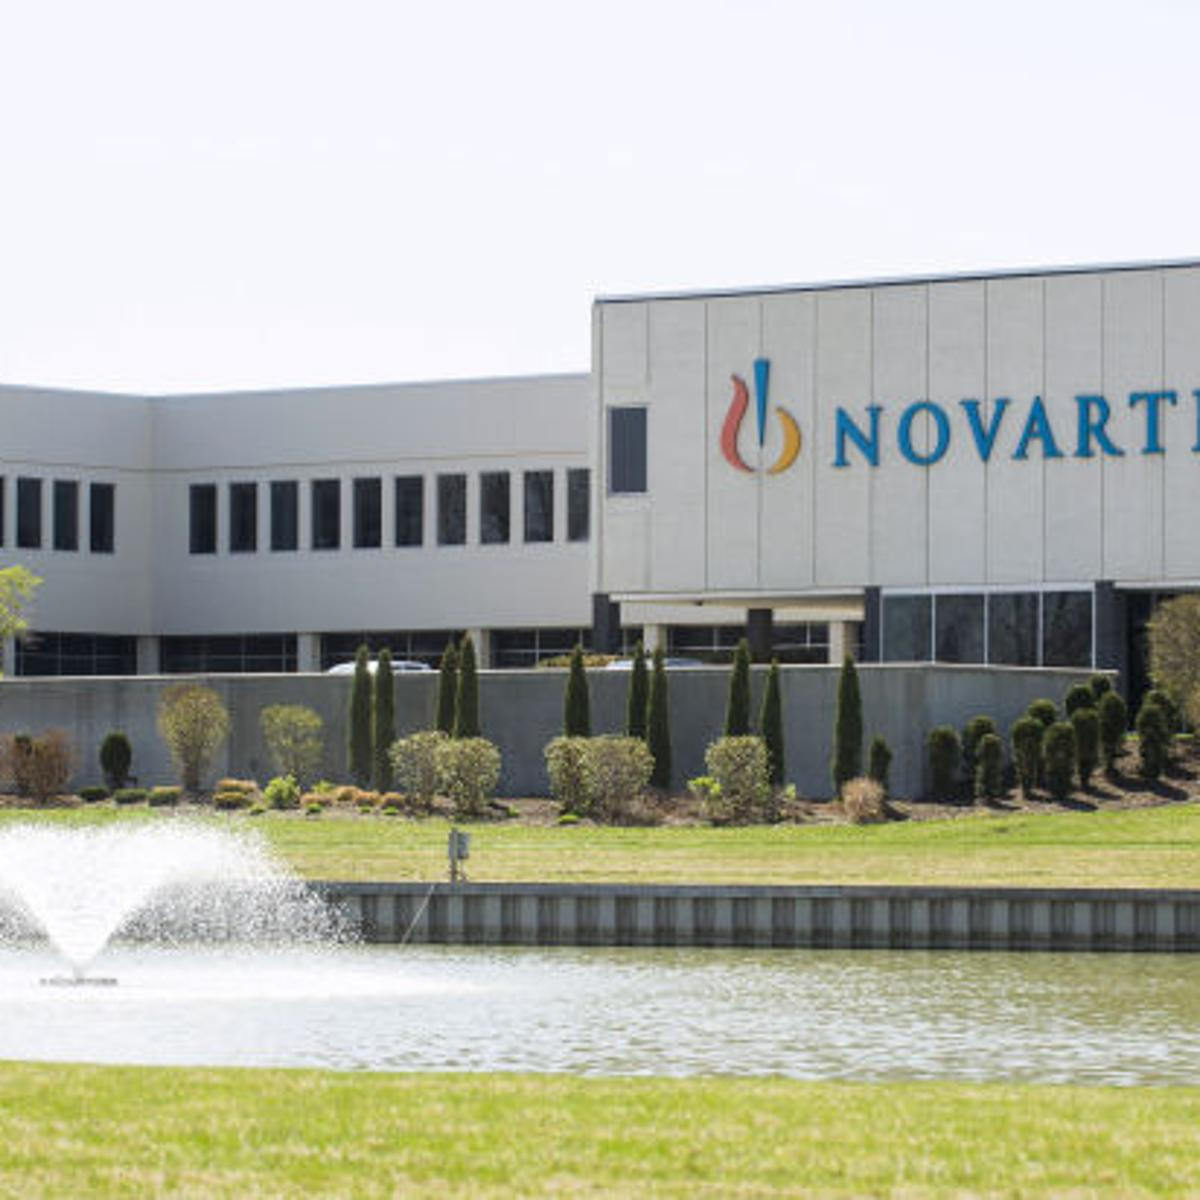 Lincoln Novartis plant now part of GlaxoSmithKline | Local